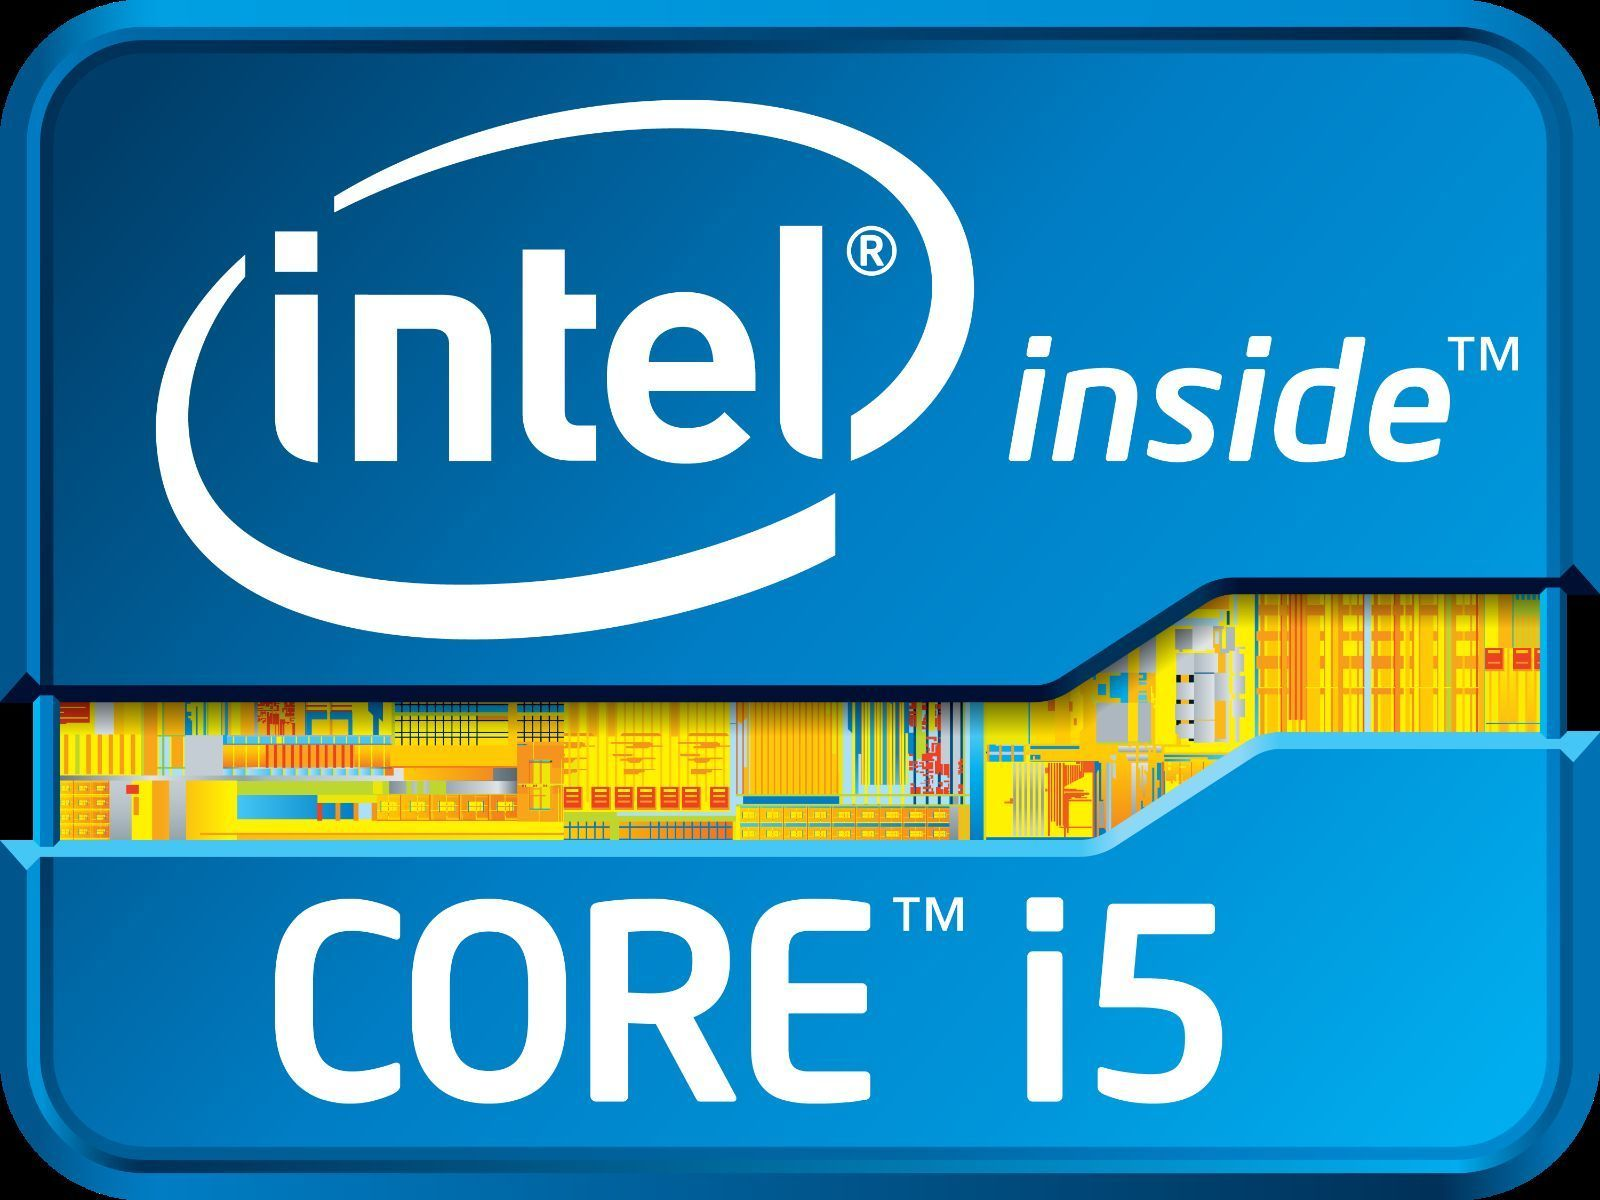 Dell 790 SFF Computer Intel Core i5 2400 QC 3.10GHZ NO HD 4gb Ram NO OS